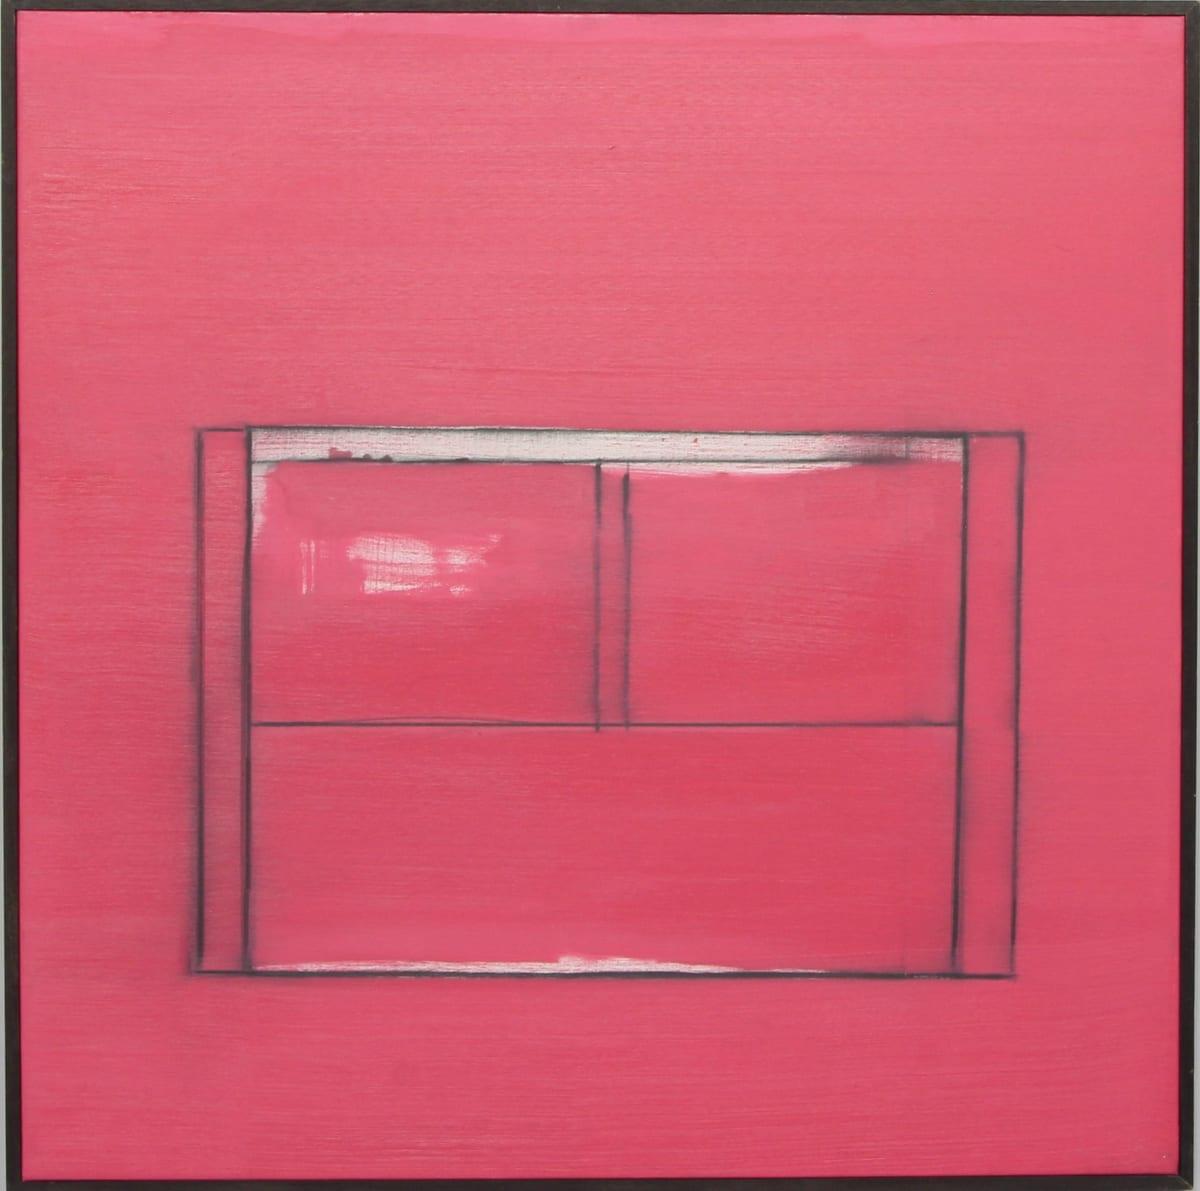 Antonio Freiles SENZA TITOLO Oil on canvas. 80 x 80 (31.5 x 31.5 in)